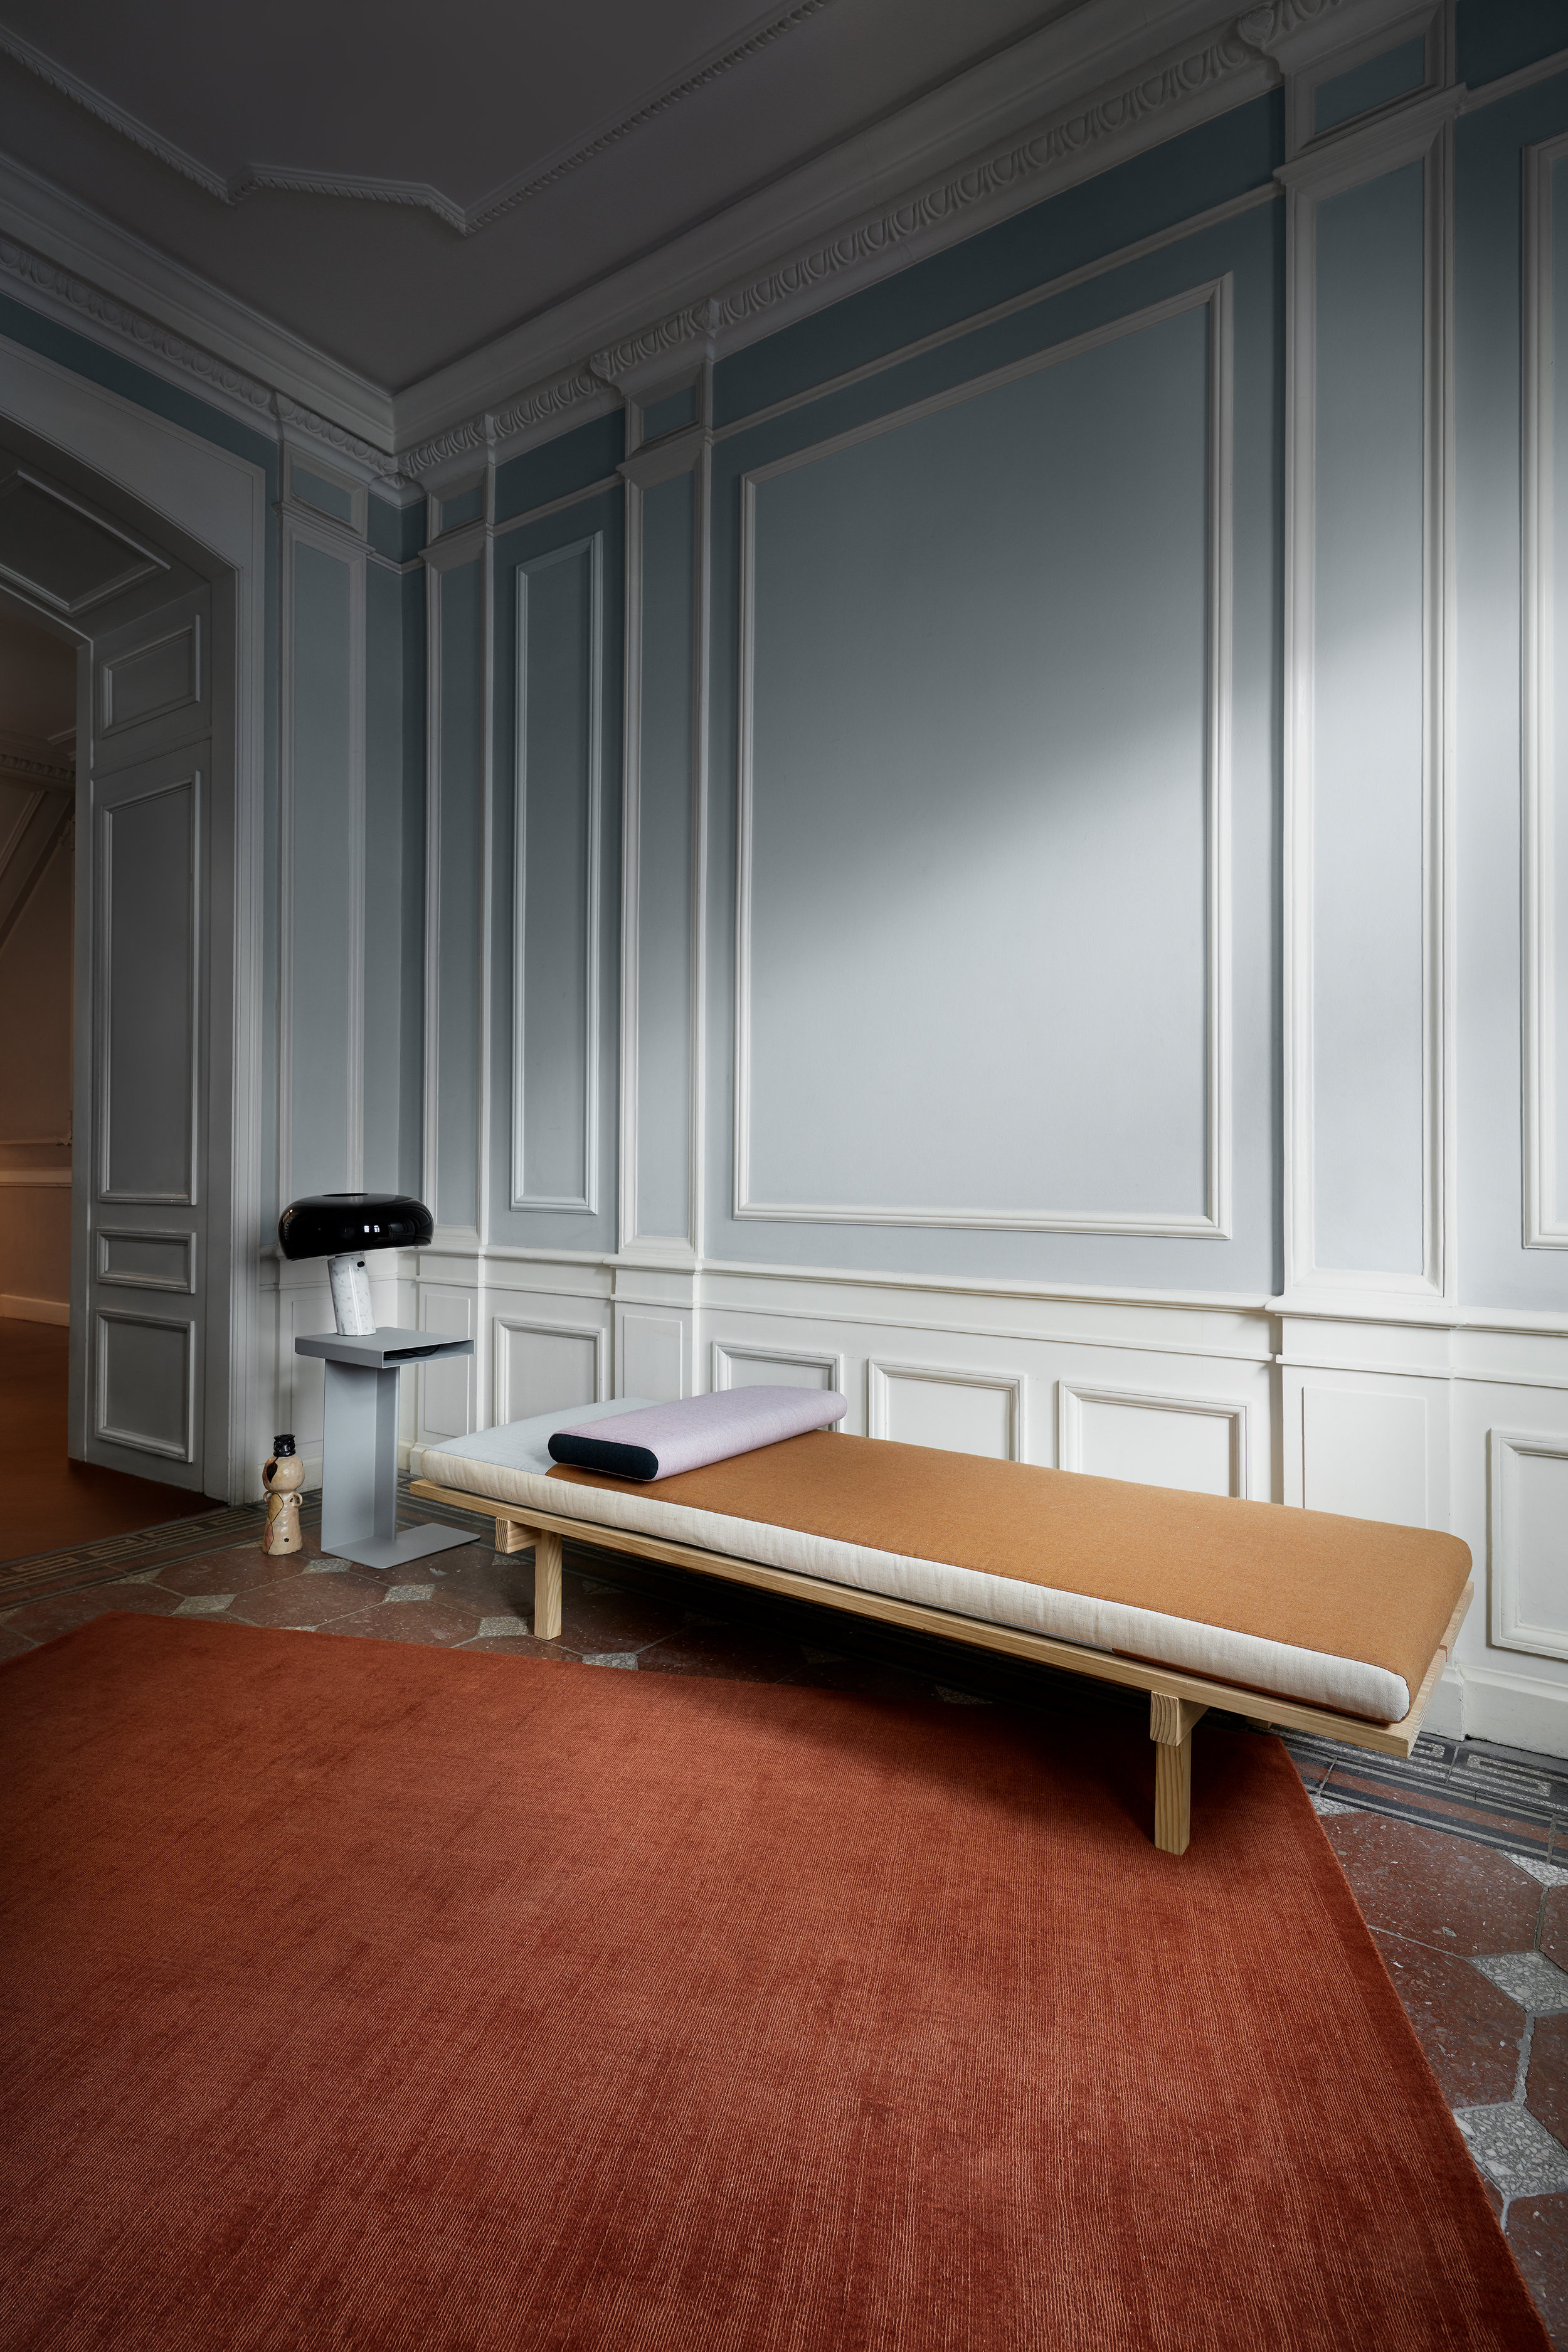 Fabula_Loke_Rug_Terracotta_Wool_2020_gestalt_new_york.jpg